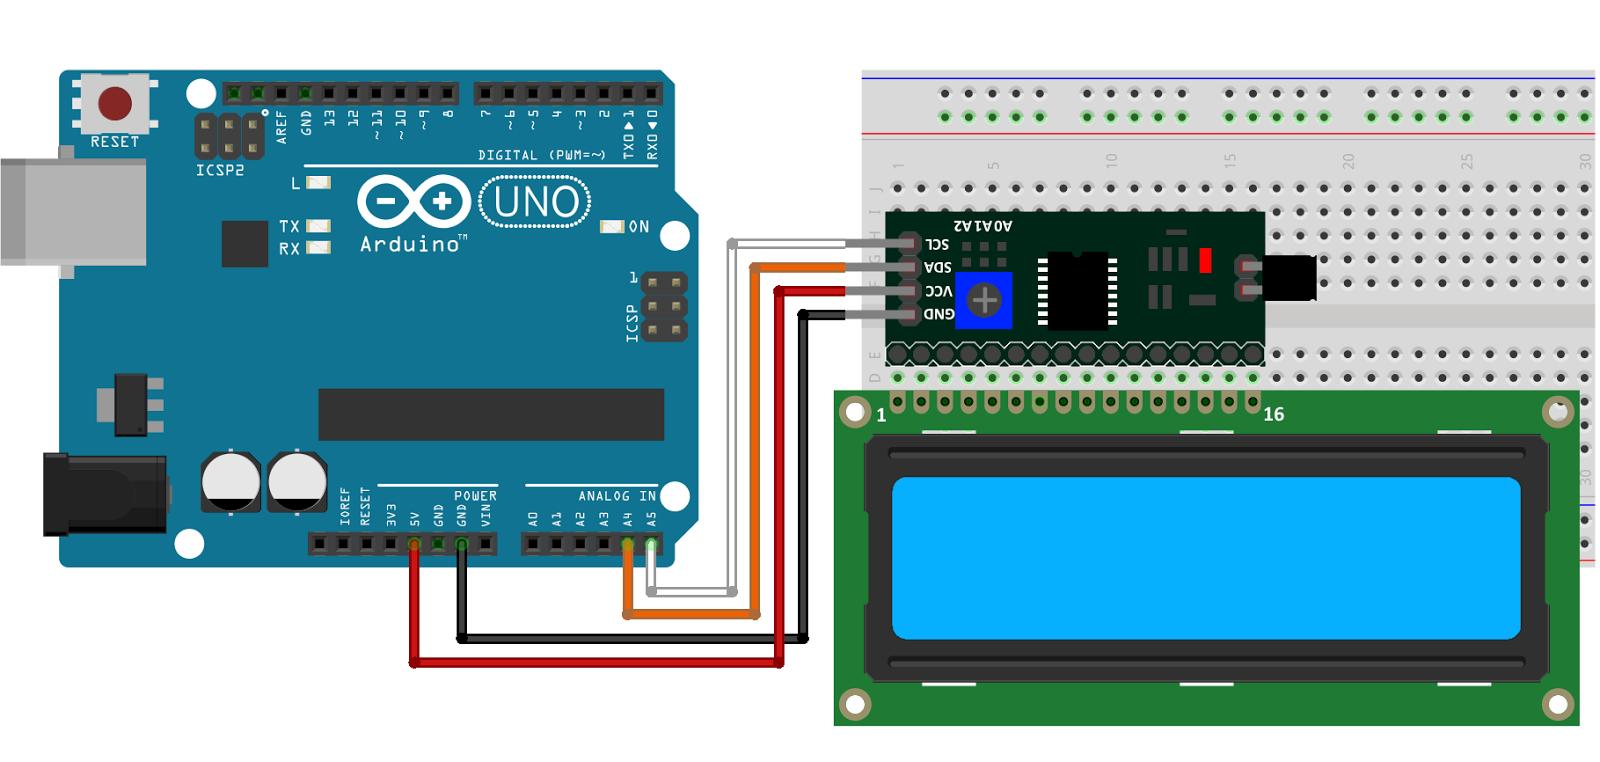 Arduino display lcd 16x2 i2c schema | Arduino display, Arduino lcd, Arduino